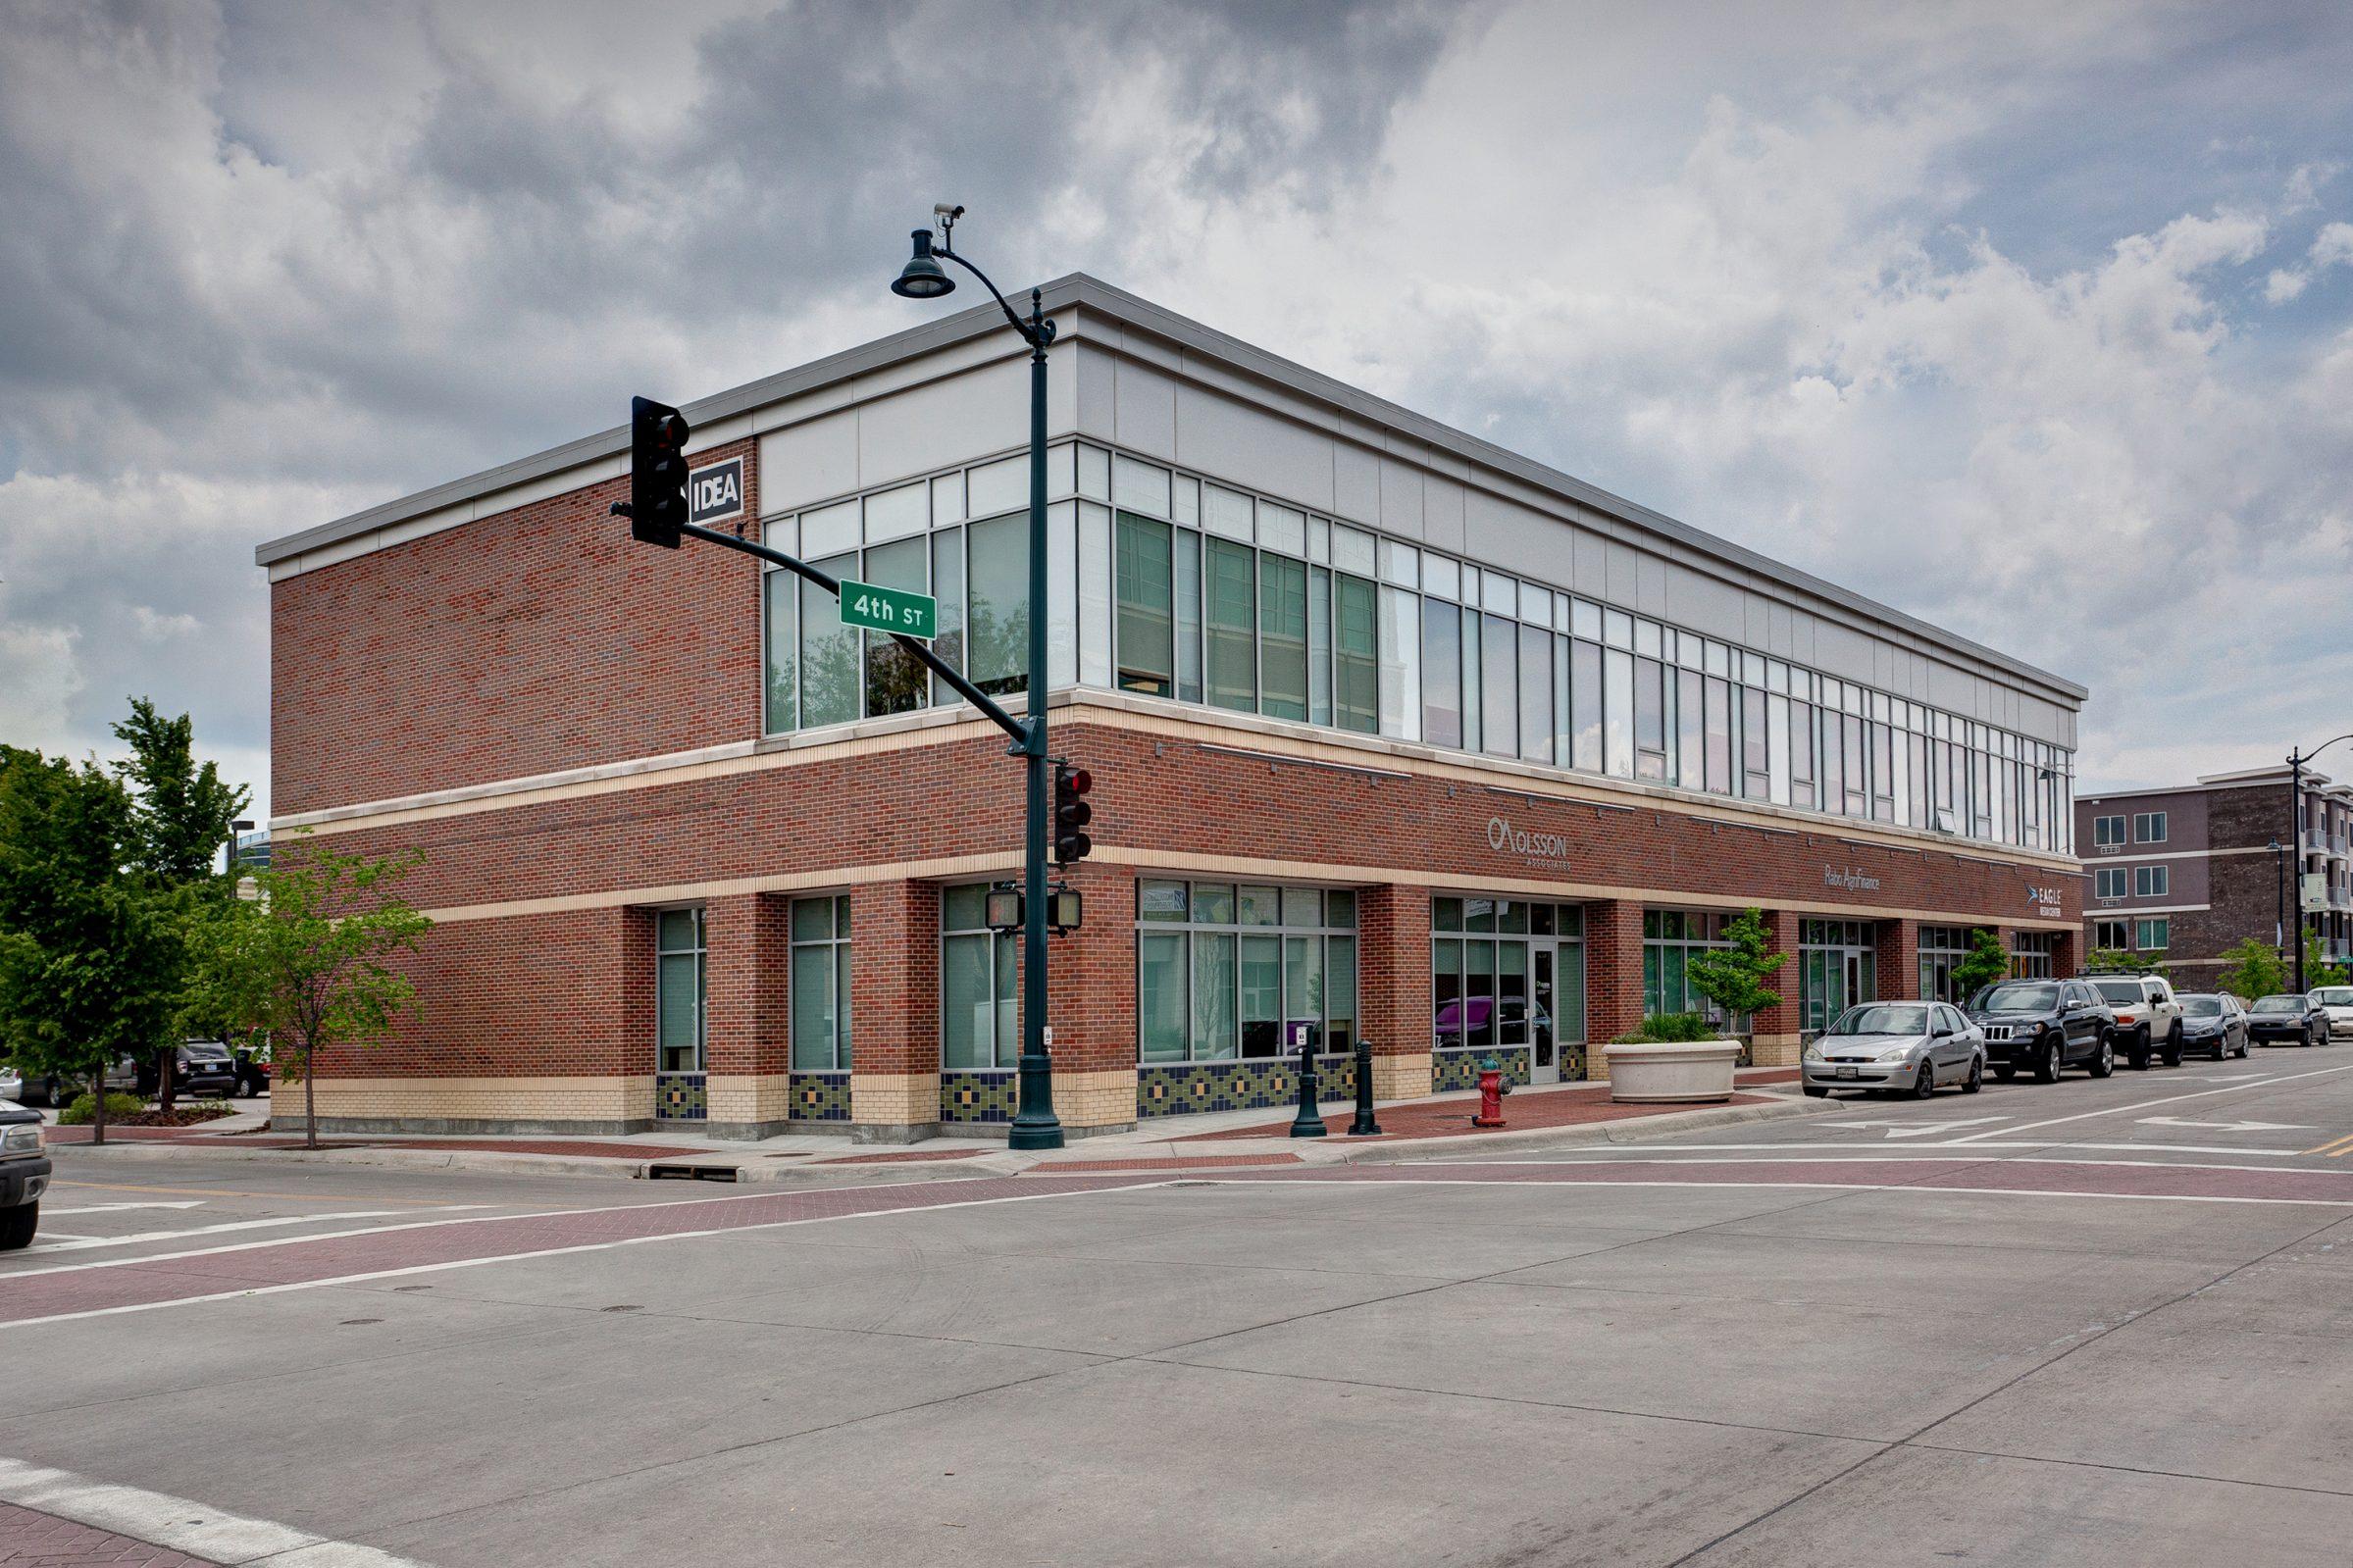 The IDEA Center Building